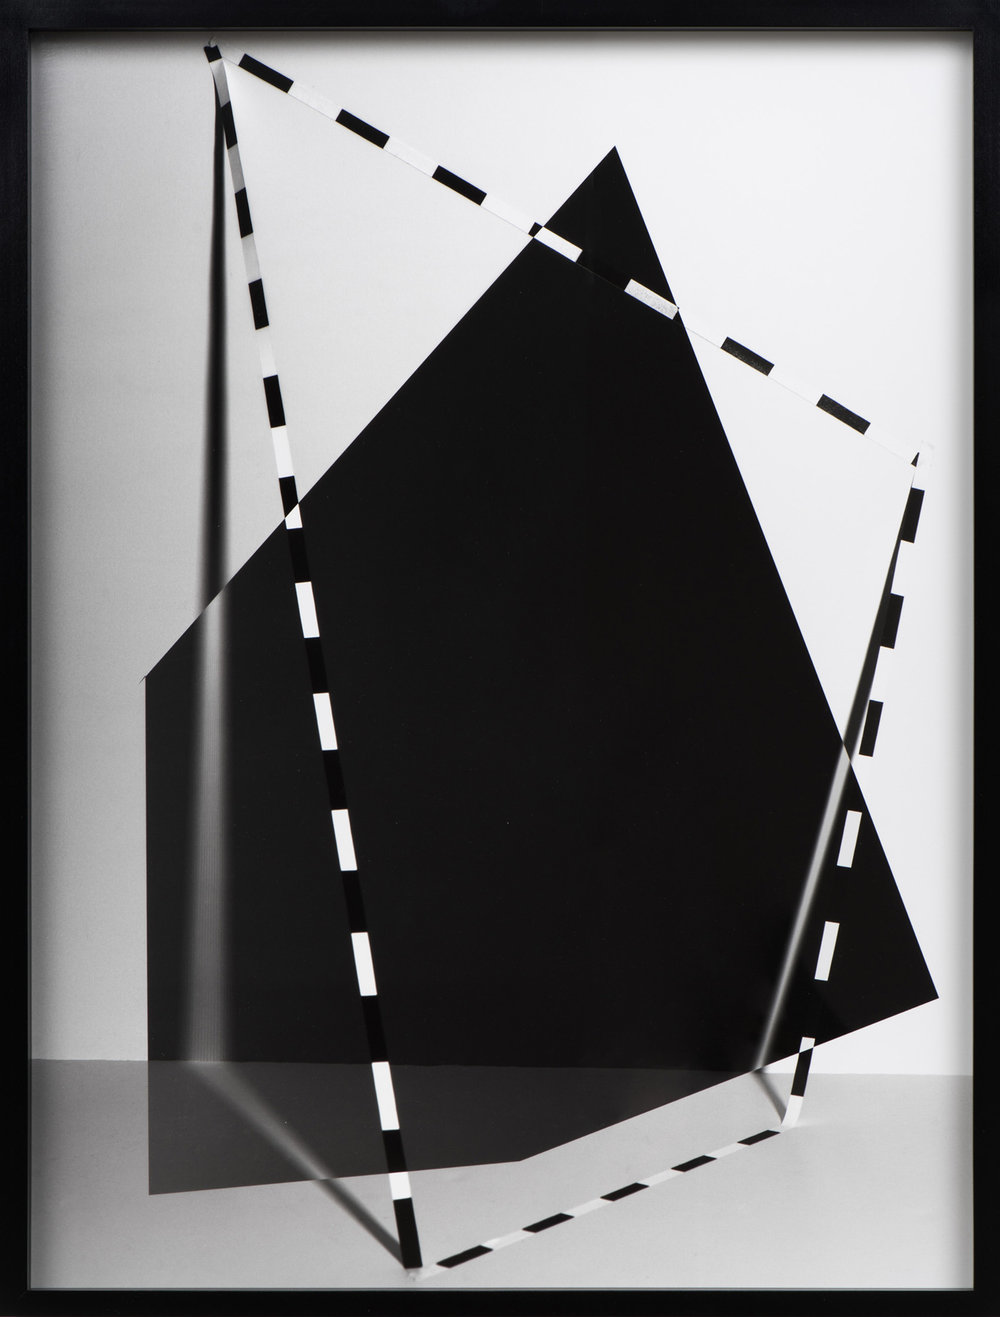 Sunglasses At Night , 2018 Silver gelatin print 24 x 18 1/8 inches